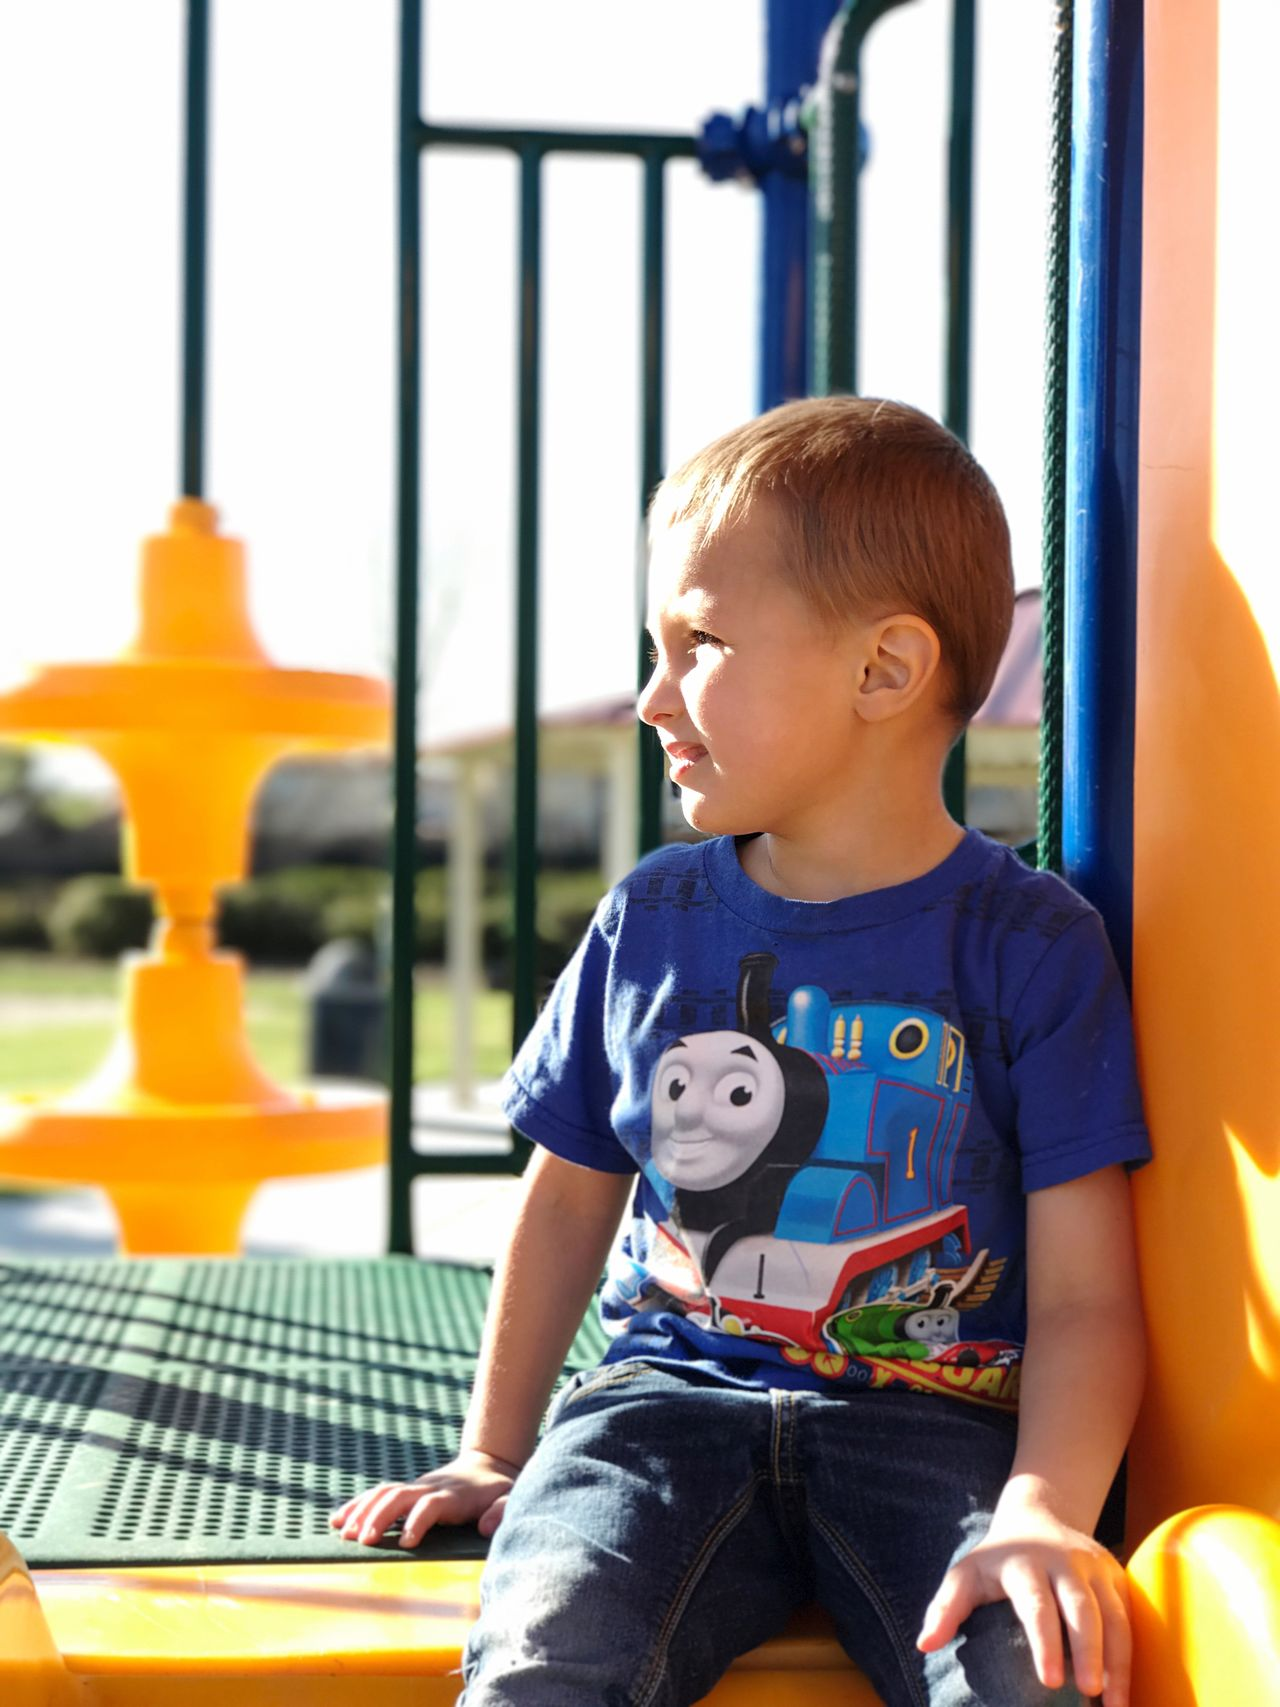 Luke Childhood Playground Innocence One Person